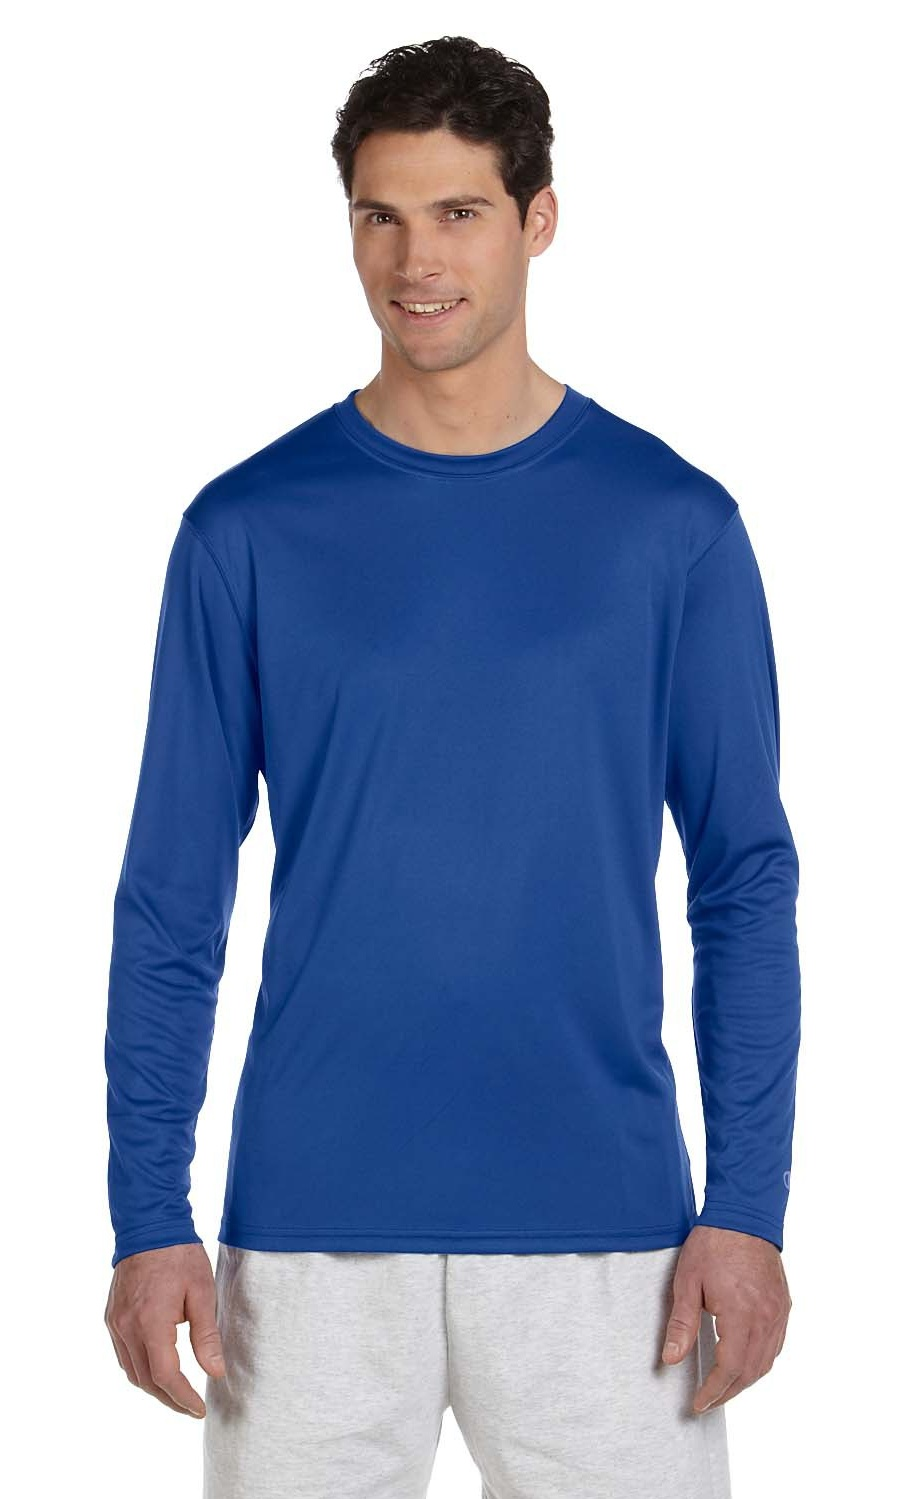 cc9feab1 Branded Champion - Branded Champion 41 oz Double Dry Long Sleeve Interlock T -Shirt - NAVY - M (Instant Saving 5% & more on min 2) - Walmart.com